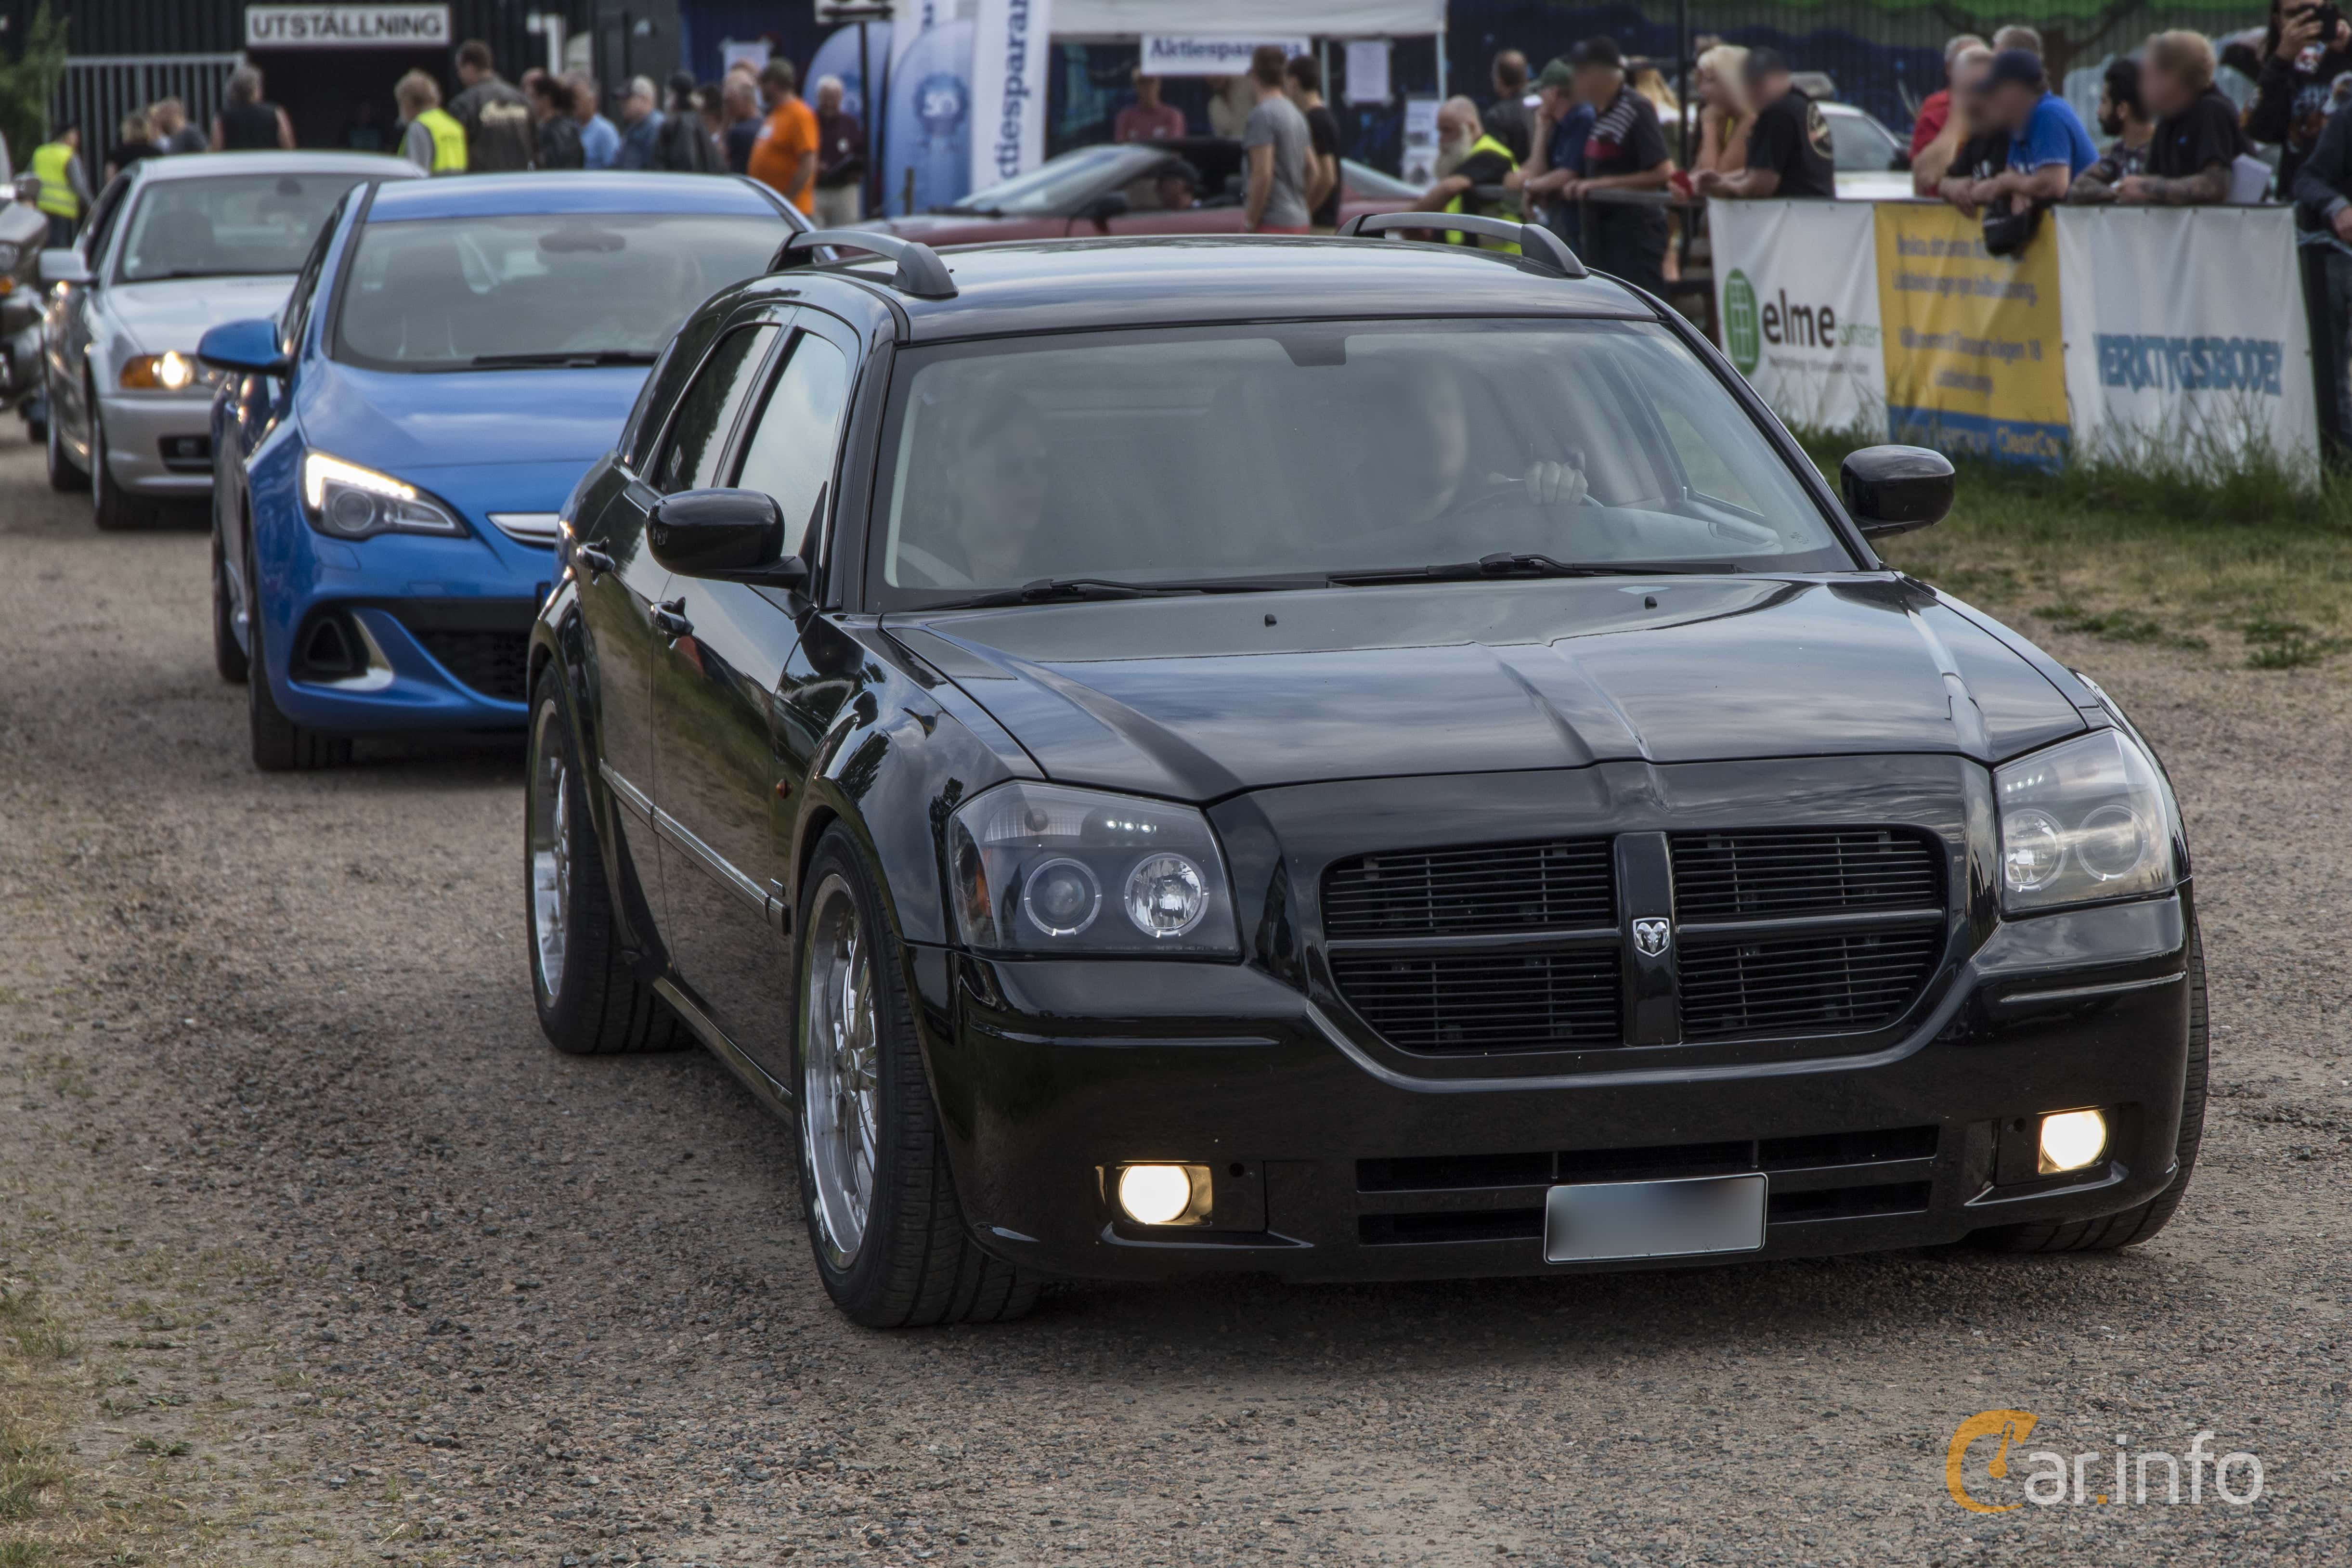 2016 Dodge Magnum >> 2 Images Of Dodge Magnum 5 7 V8 Hemi Automatic 345hp 2005